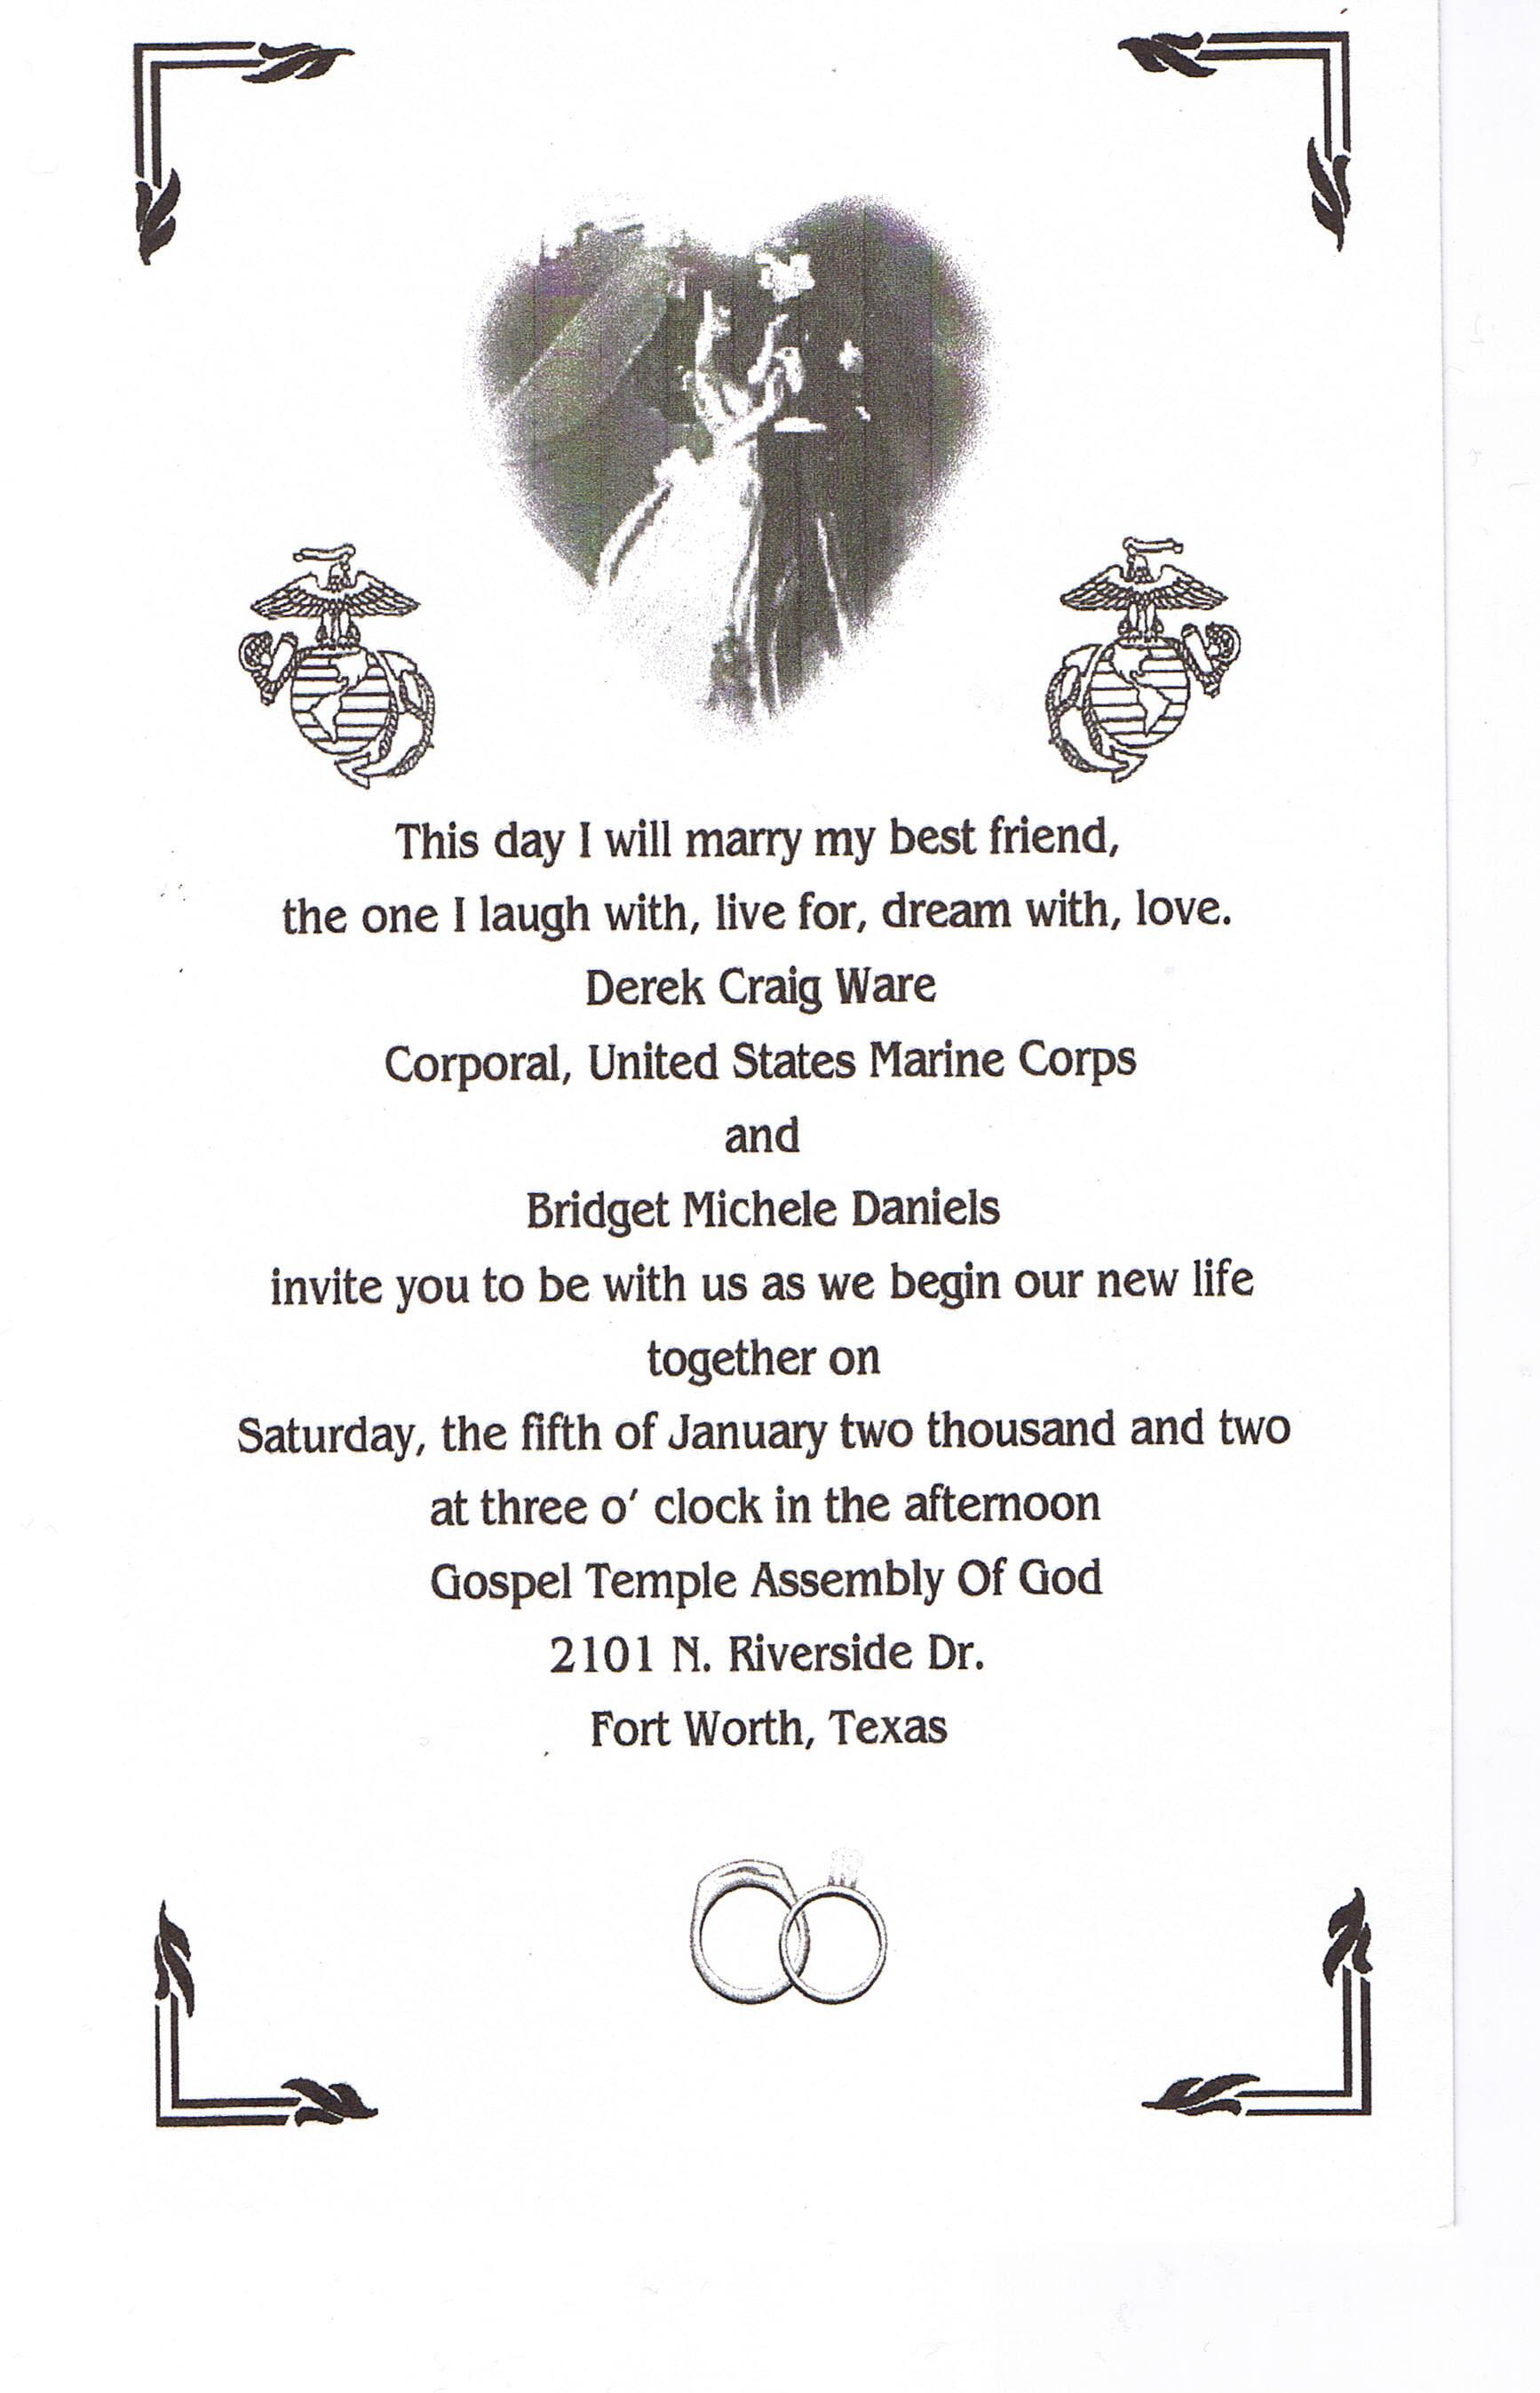 Wedding Invitation Templates In Marathi Wedding Invitation Sample In